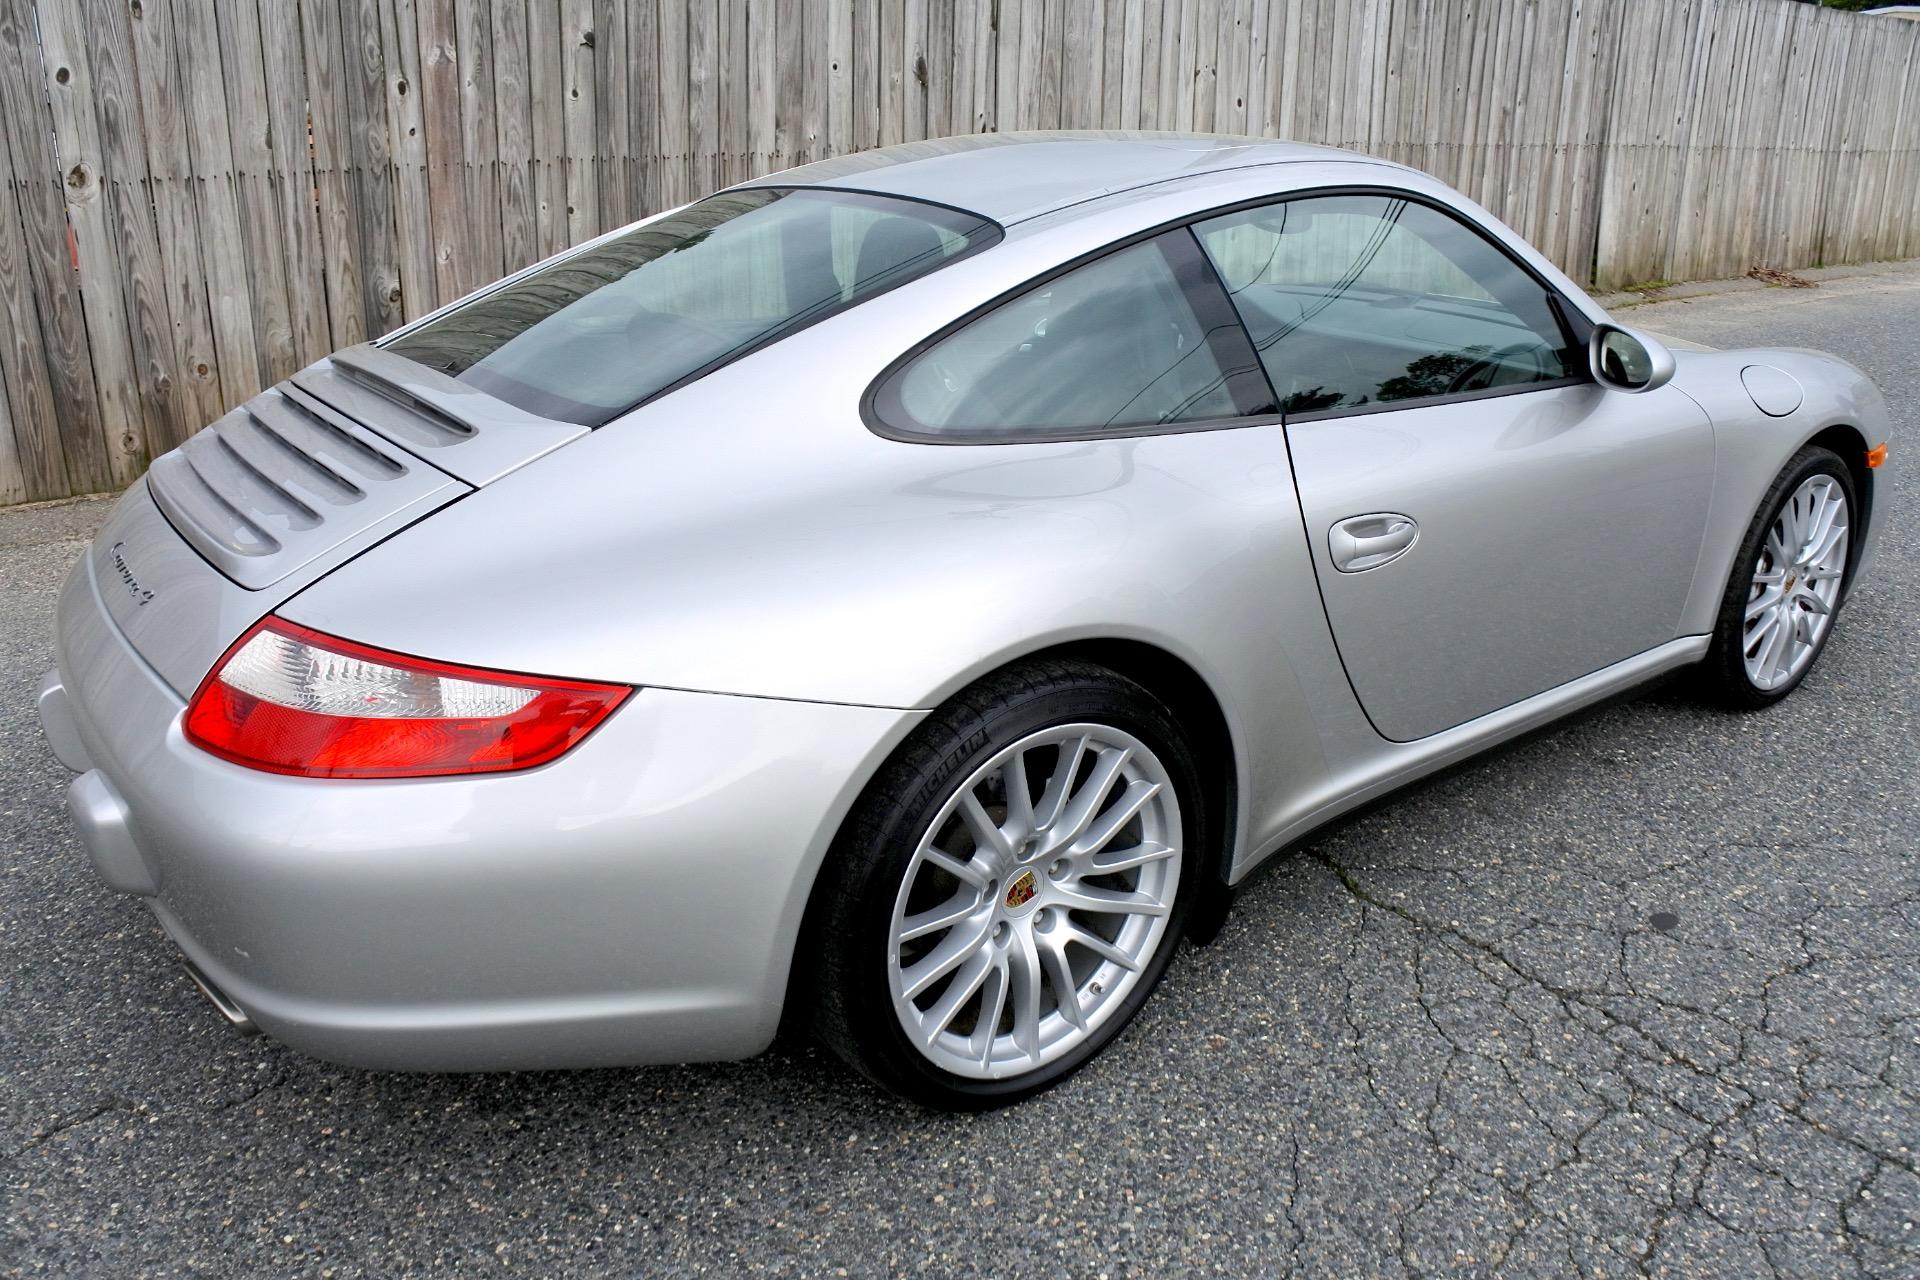 Used 2006 Porsche 911 Carrera 4 Used 2006 Porsche 911 Carrera 4 for sale  at Metro West Motorcars LLC in Shrewsbury MA 5